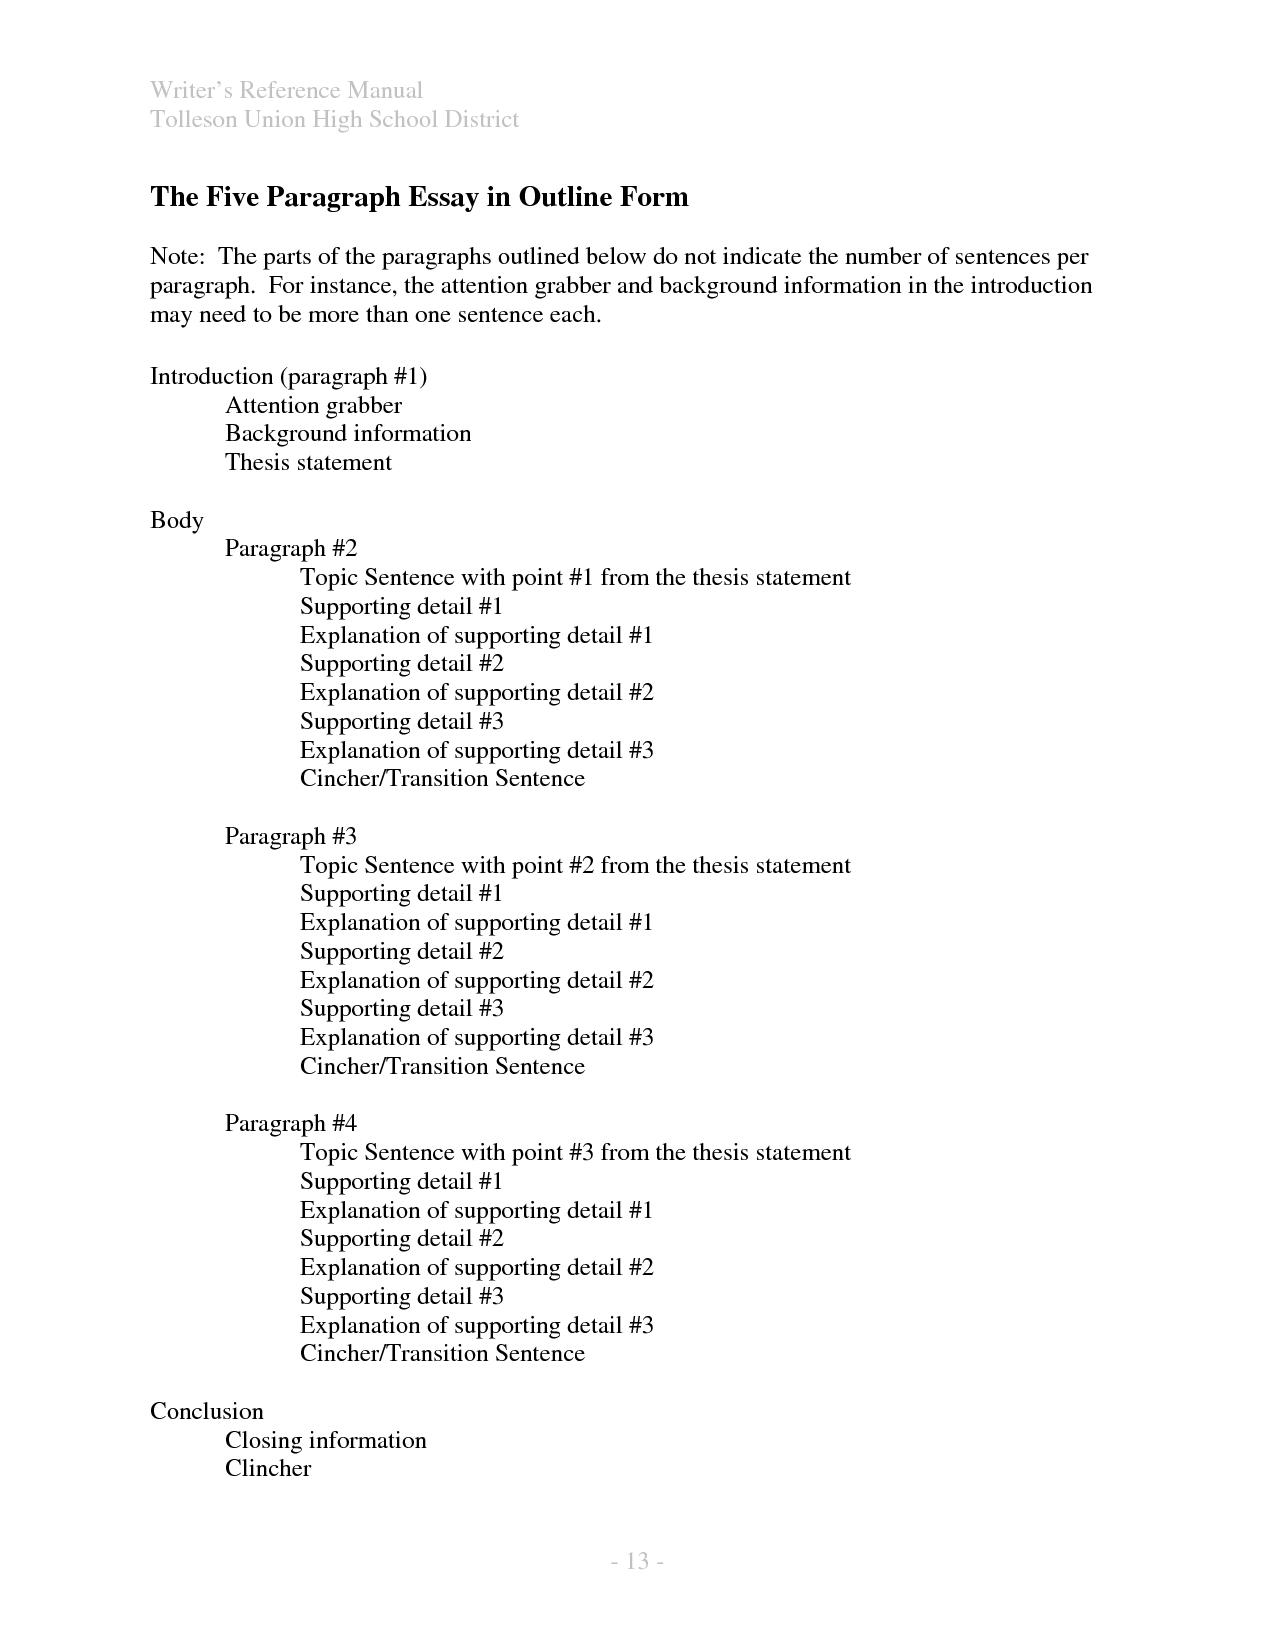 005 Argumentative Essay College Outline Pdf Printables Corner Seaapi Com Wp Content Uploads Argumentativ Caus Stupendous Topics For Middle School Simple Persuasive High Full